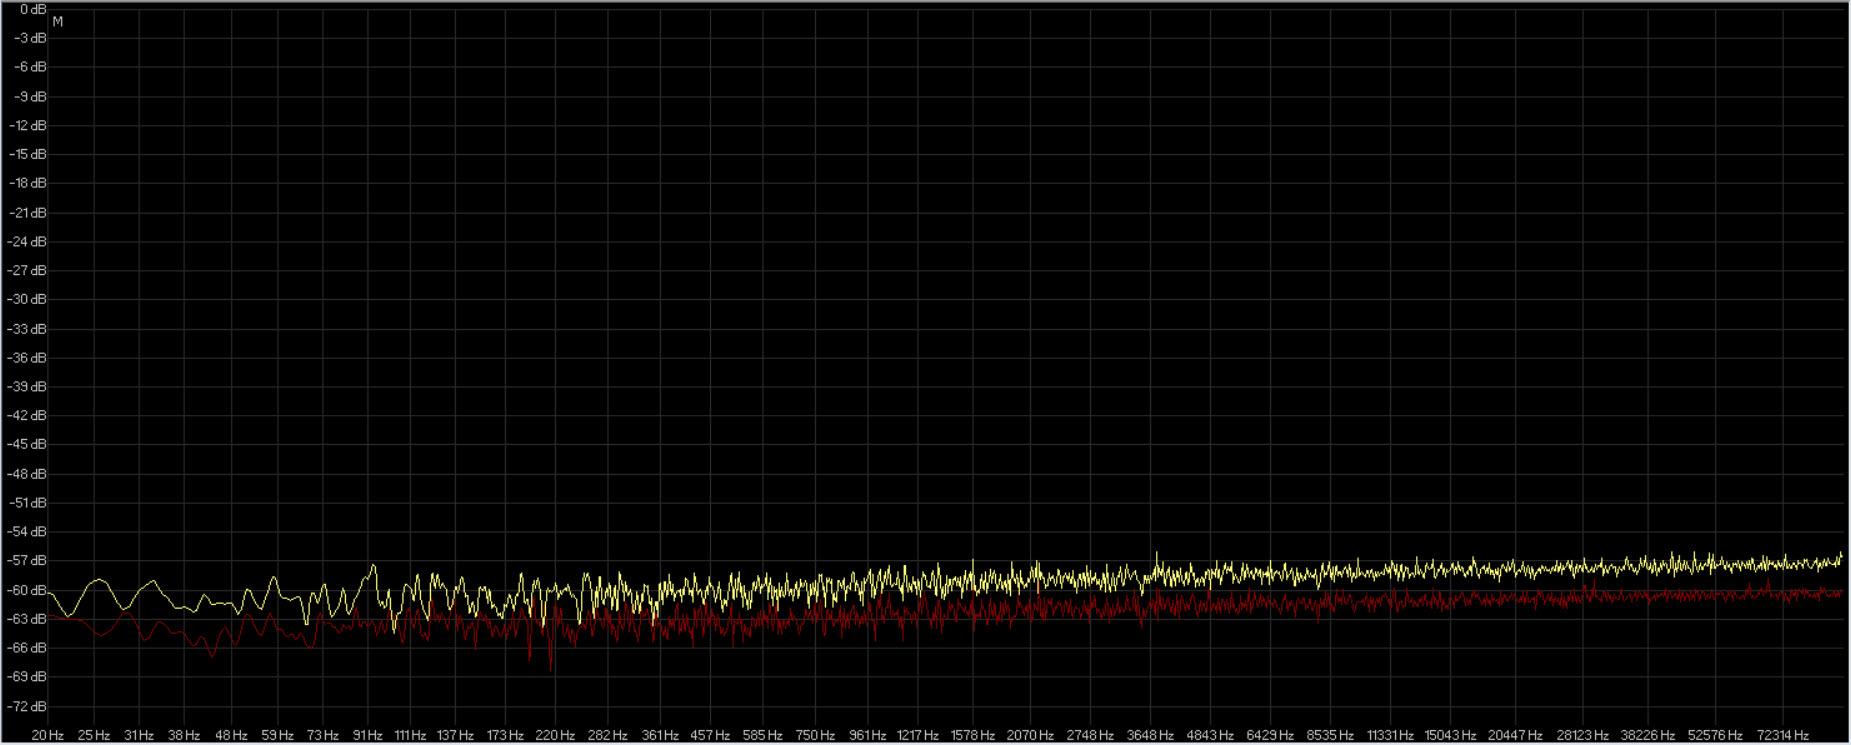 rumorebianco 32fp-384 awave ( giallo ) rx5 e dbpower ( rosso ).jpg